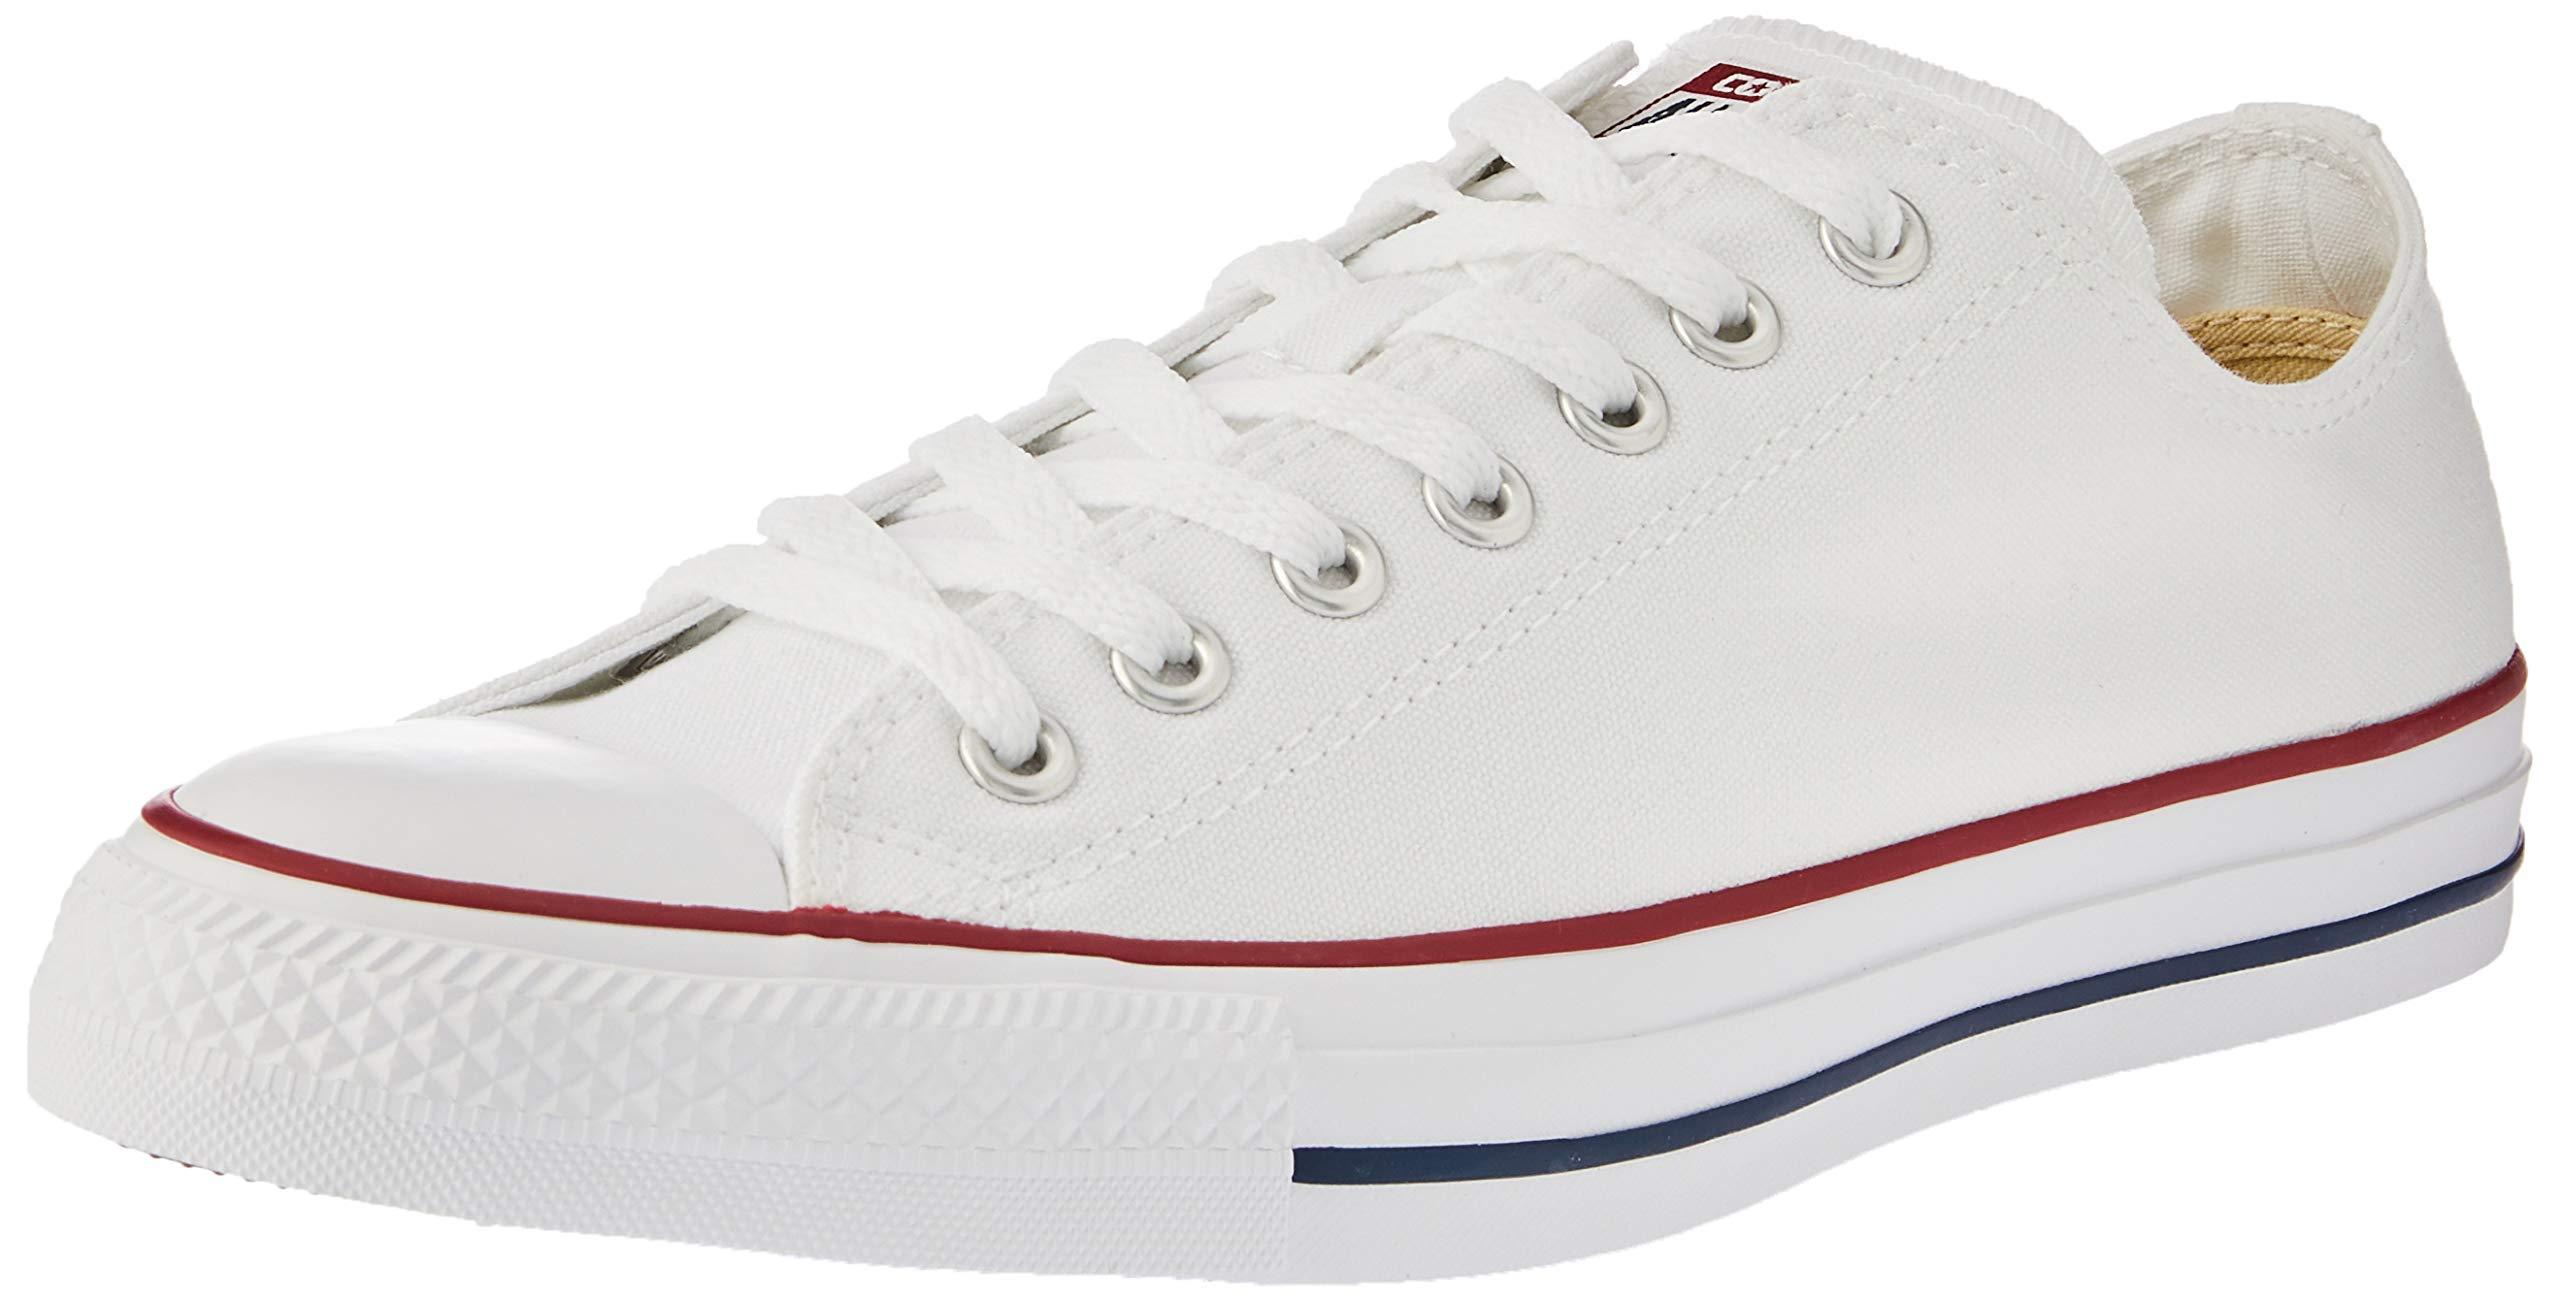 Converse Unisex Chuck Taylor All Star Low Top Optical White Sneakers - 12.5 B(M) US Women / 10.5 D(M) US Men